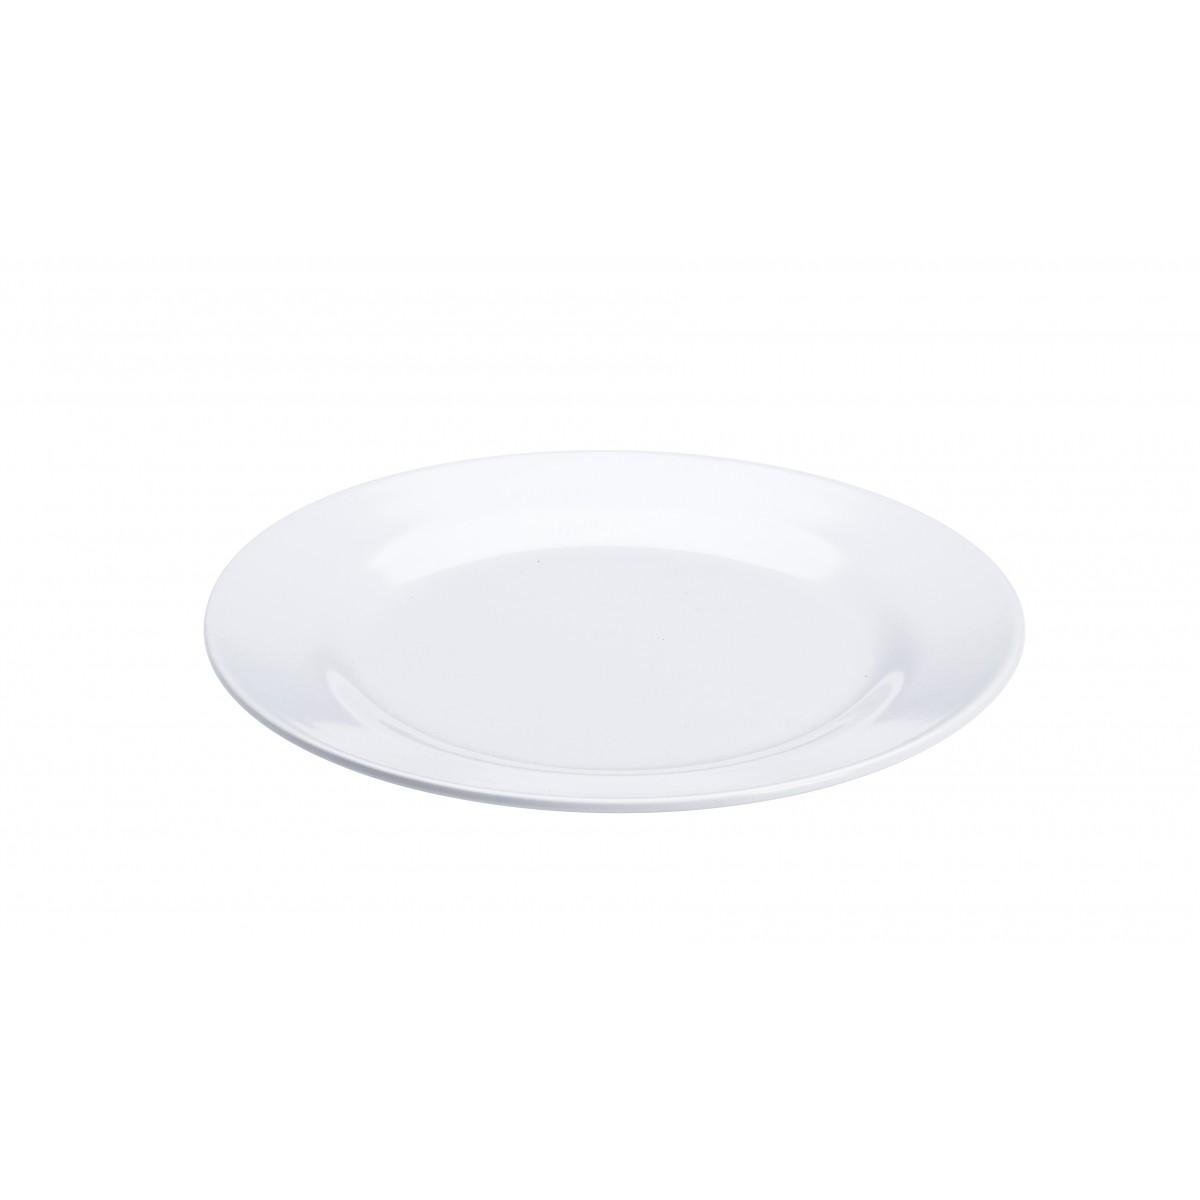 PLAST1 Melamin tallerken 20 cm hvid